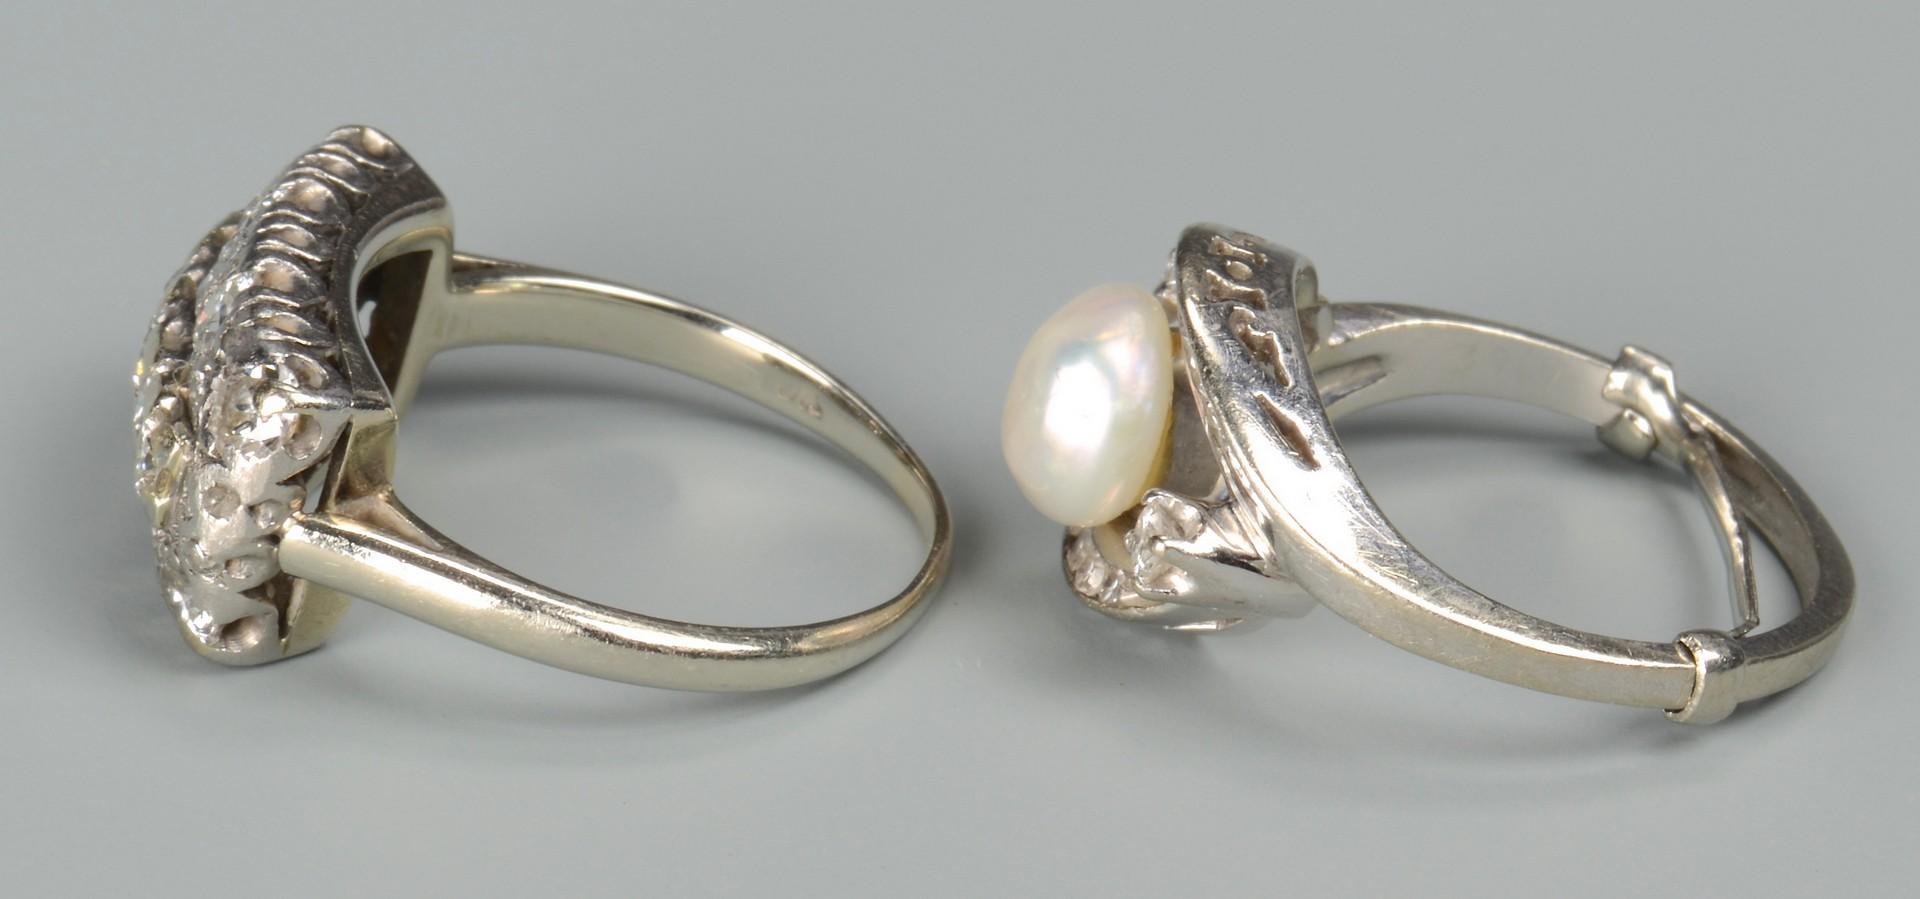 Lot 662: Two 14k Vintage Diamond Rings